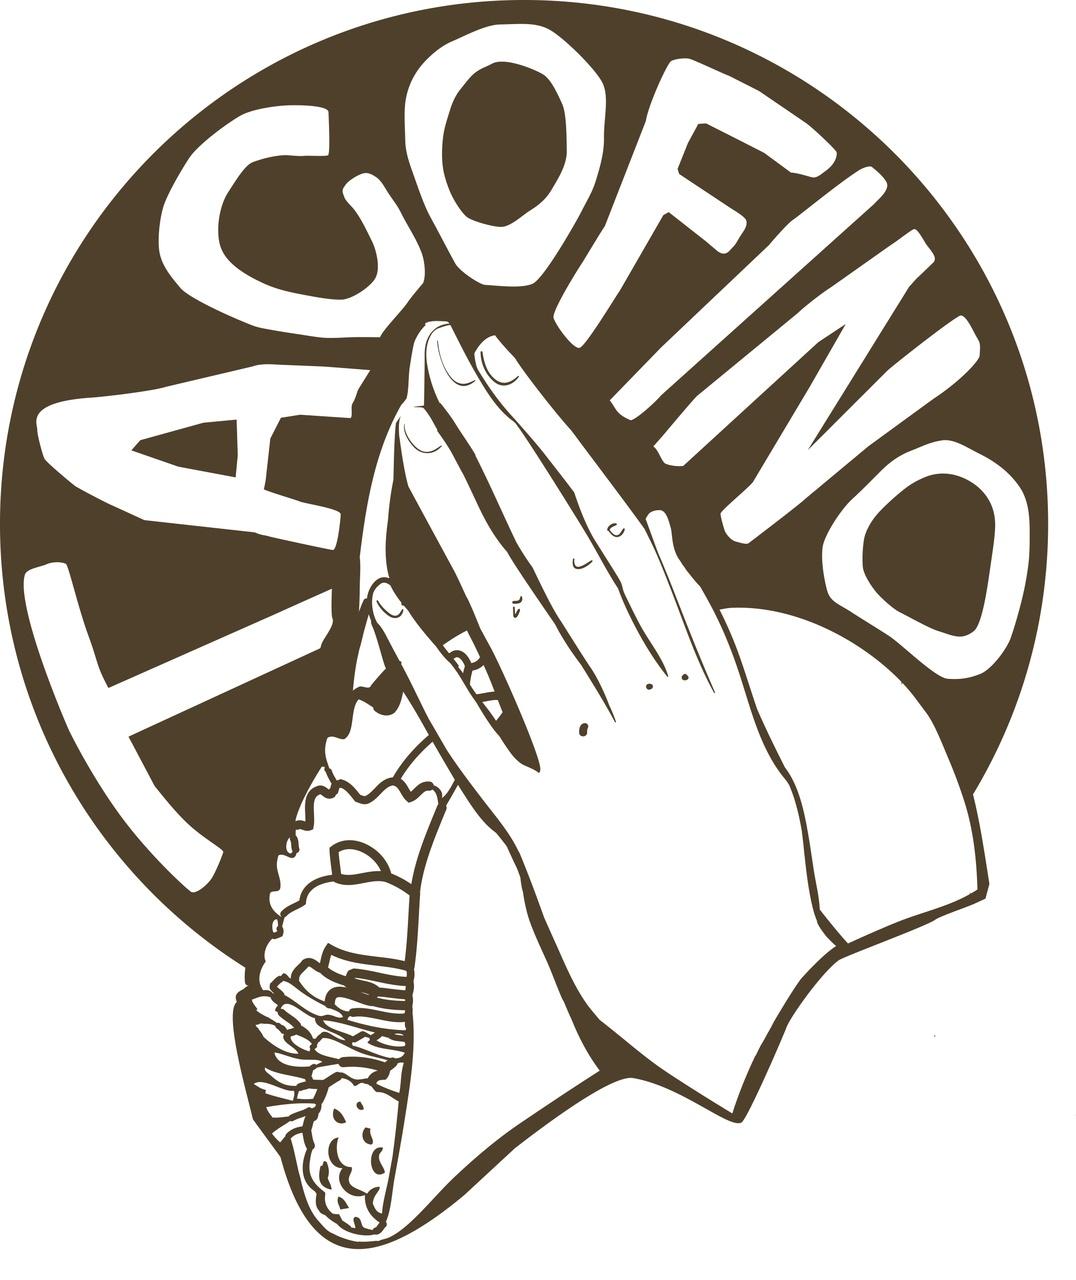 Image result for tacofino logo